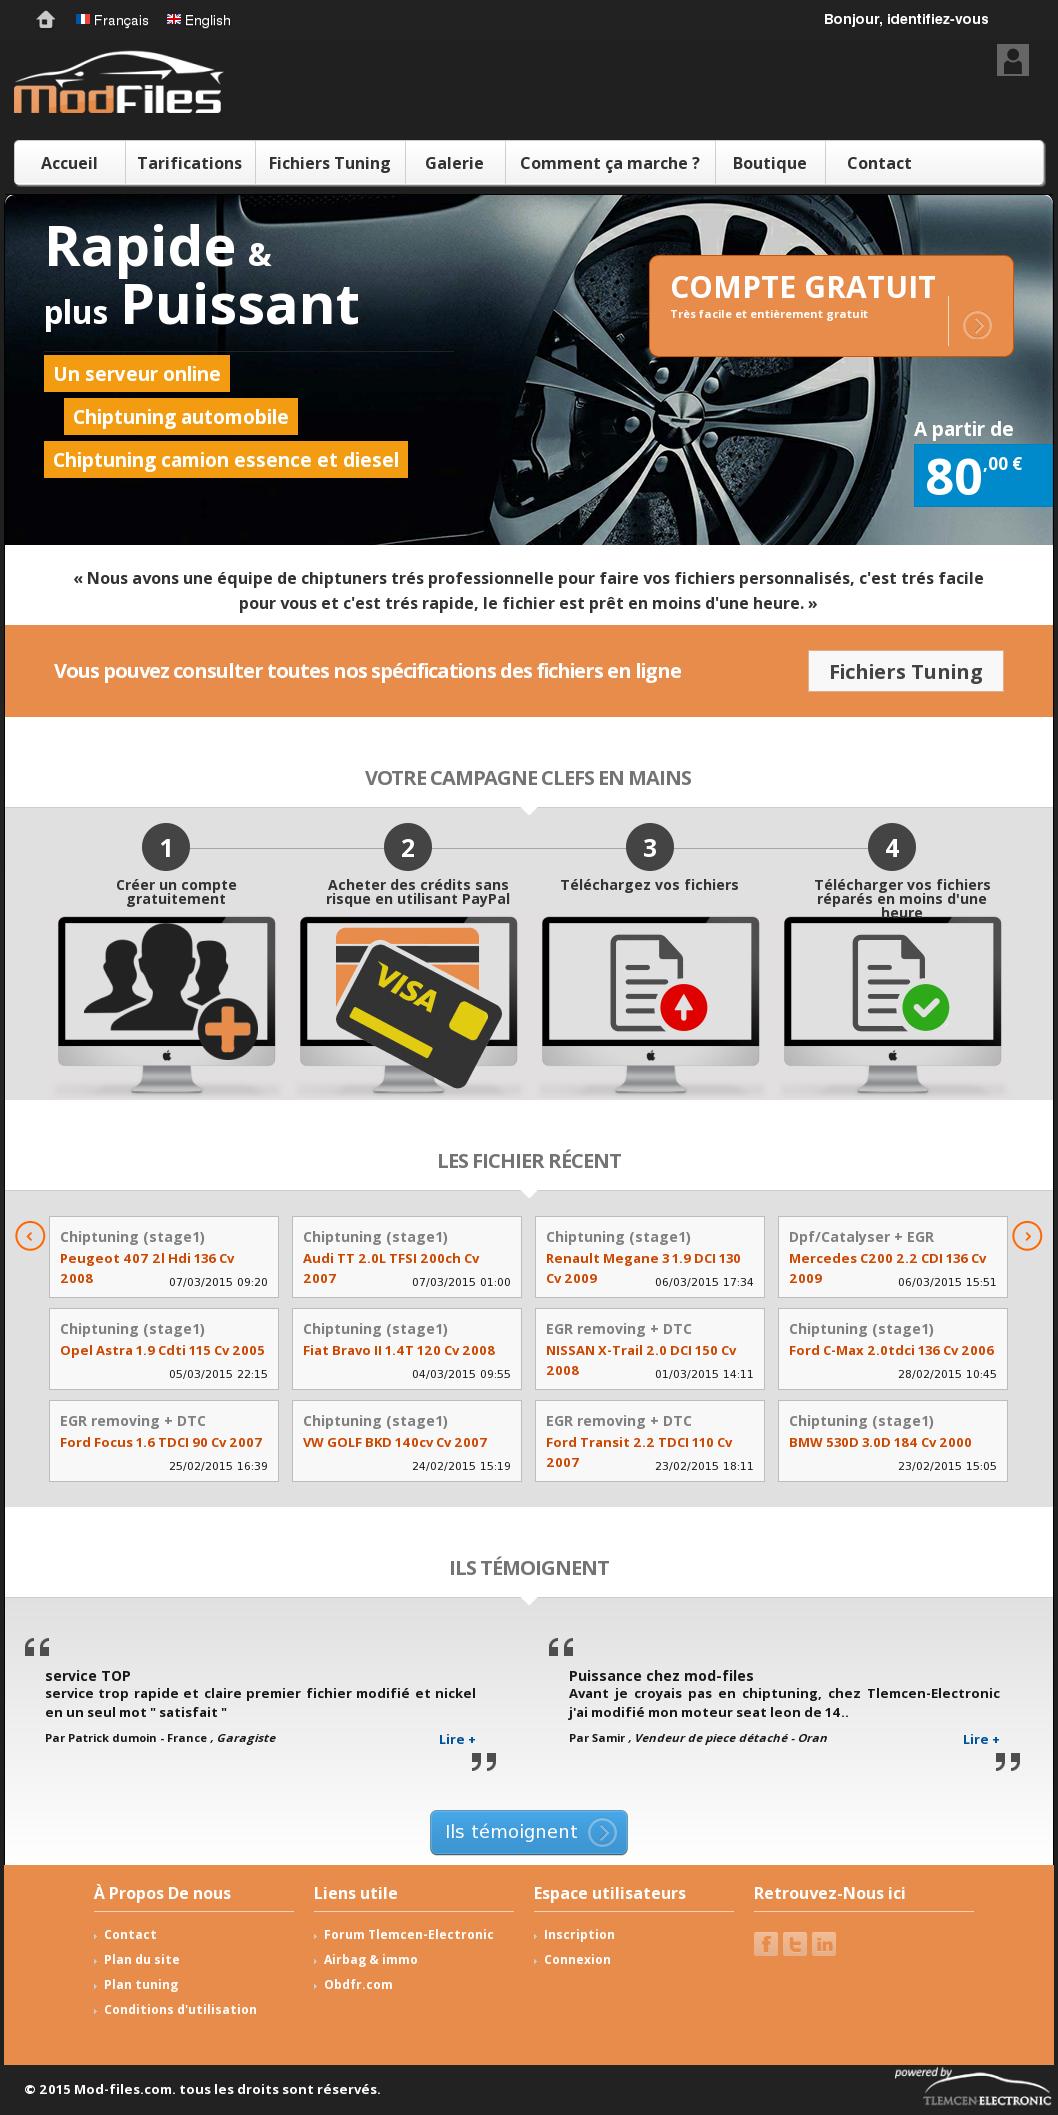 Tlemcen electronic petitors Revenue and Employees Owler